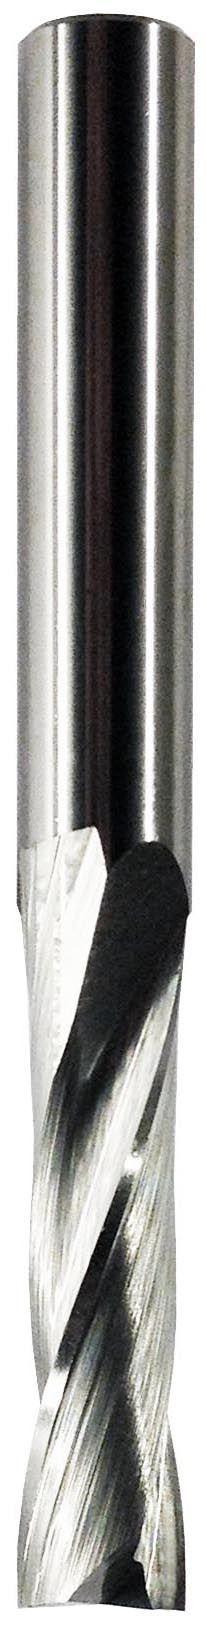 15 best technik images on pinterest firewood rocket stoves and vhw spiralnutfrser d8 s8 fandeluxe Gallery